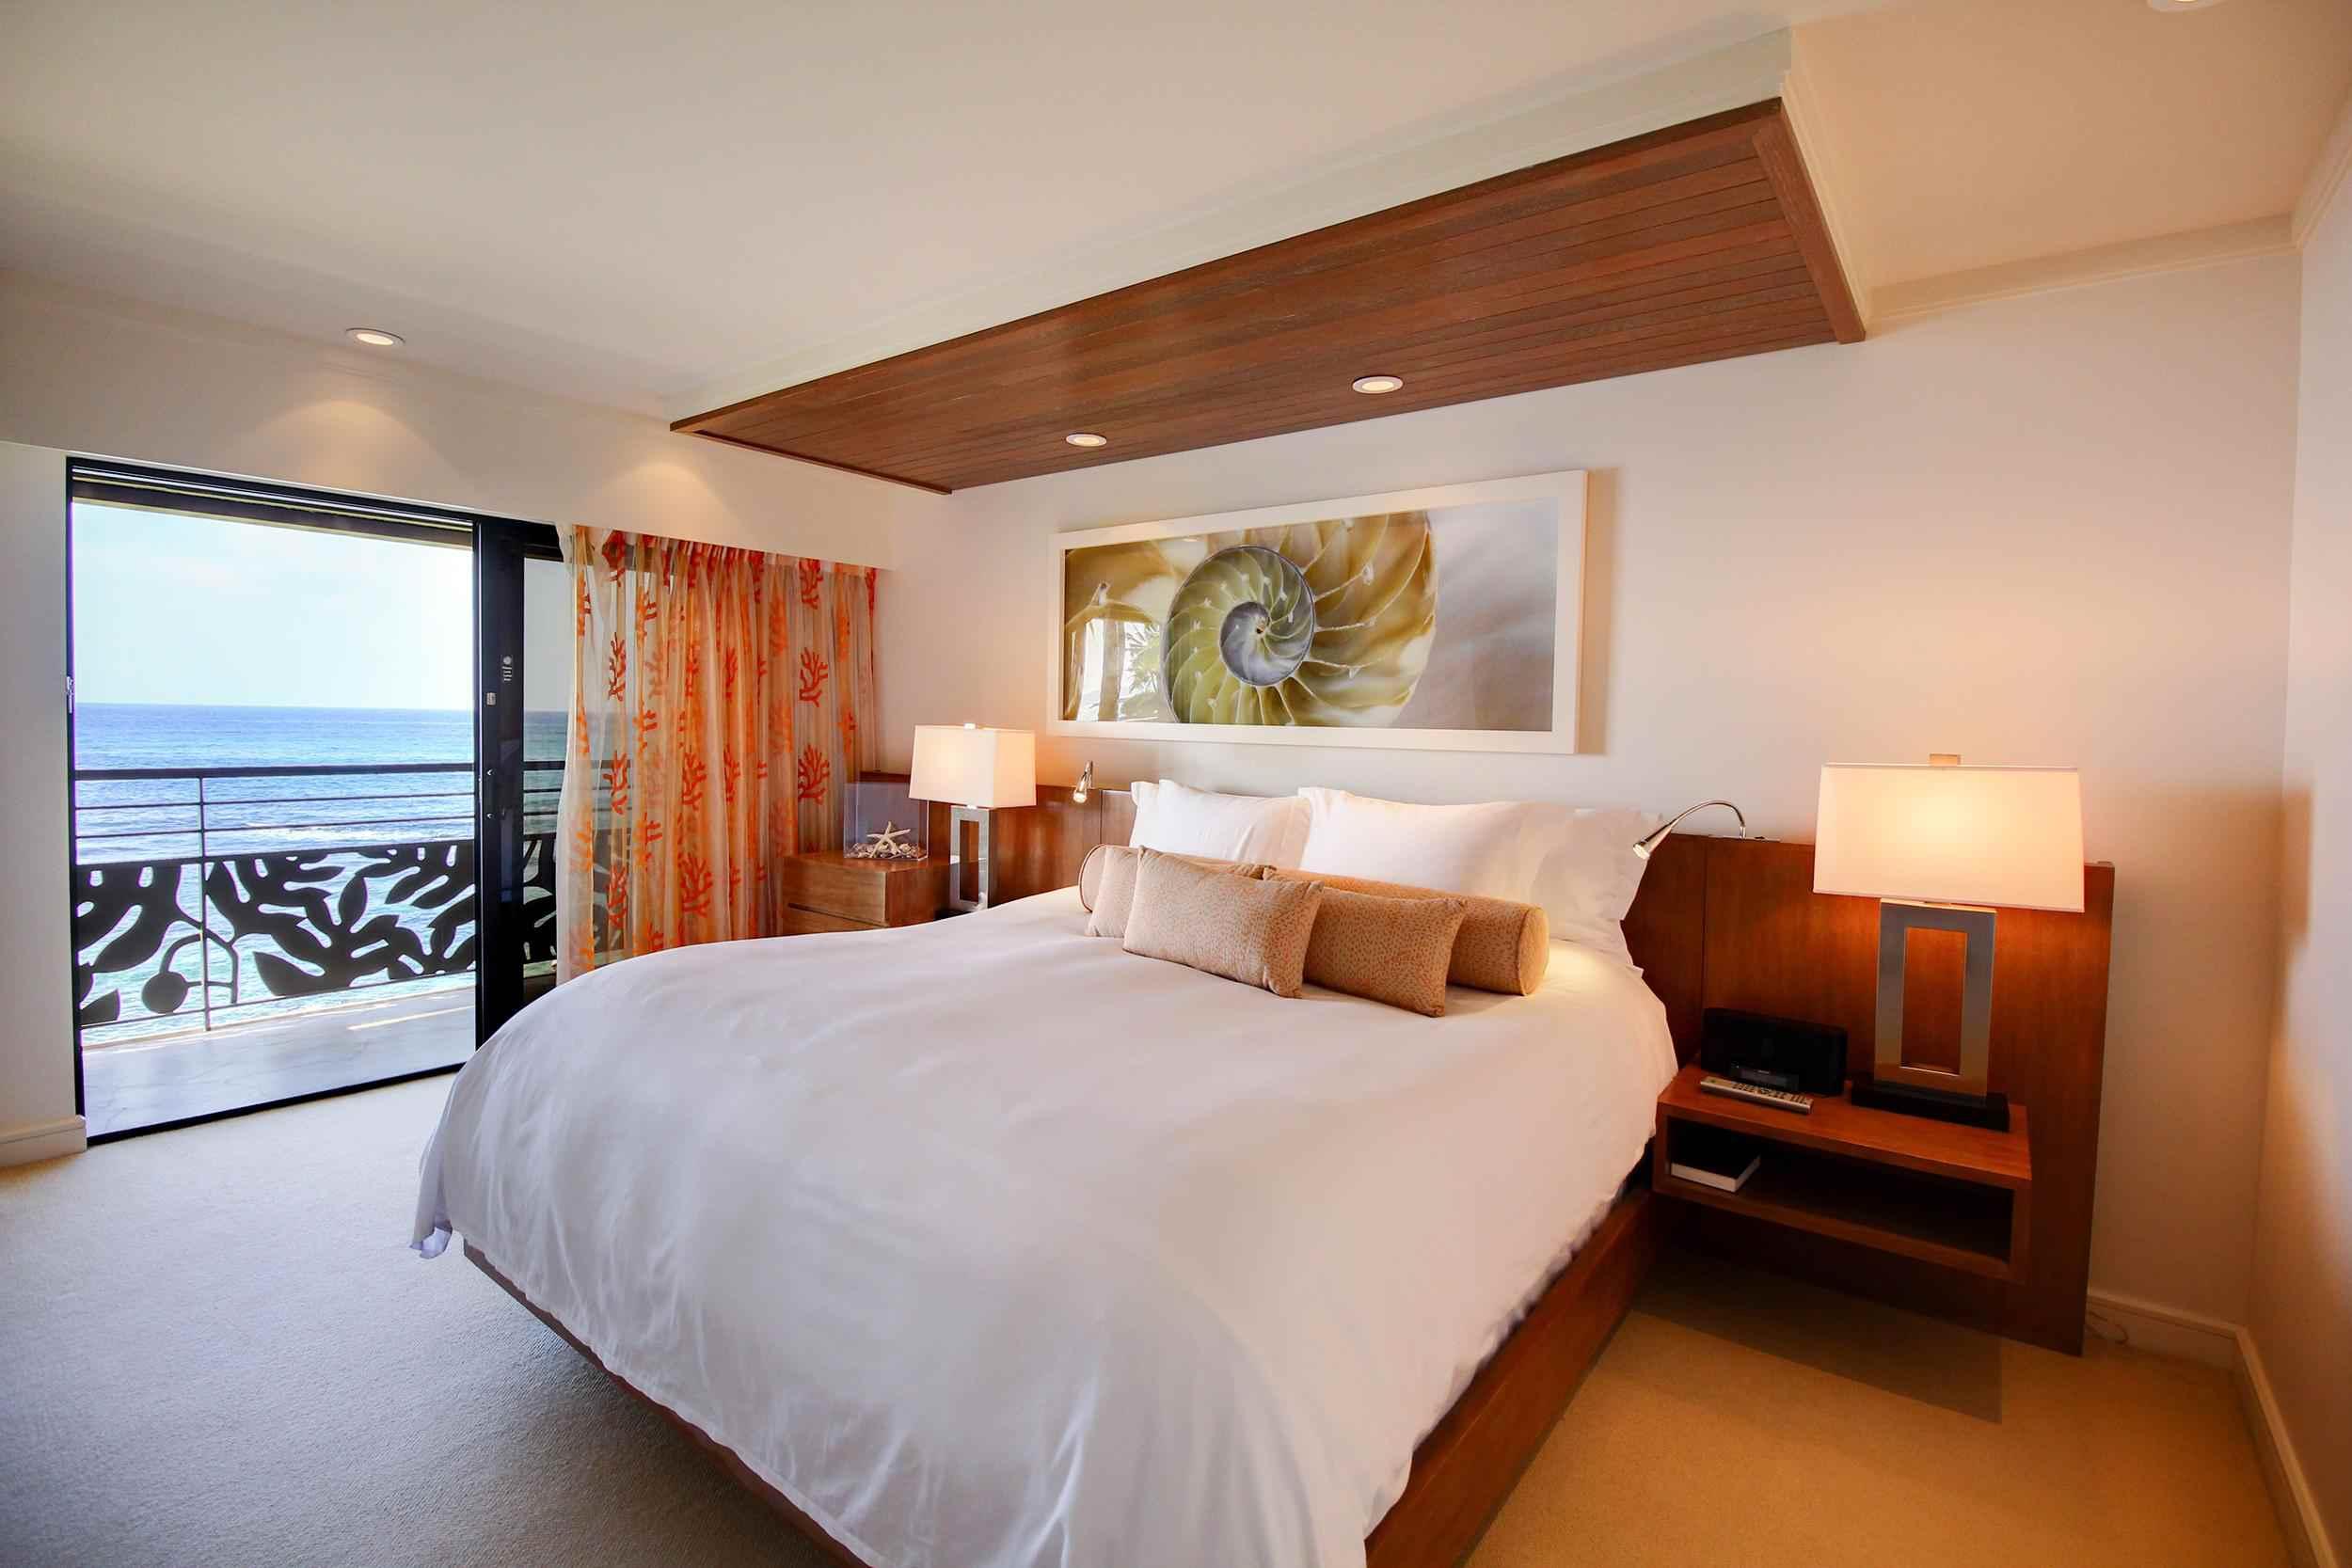 Ko'a Kea Hotel & Resort, Kauai